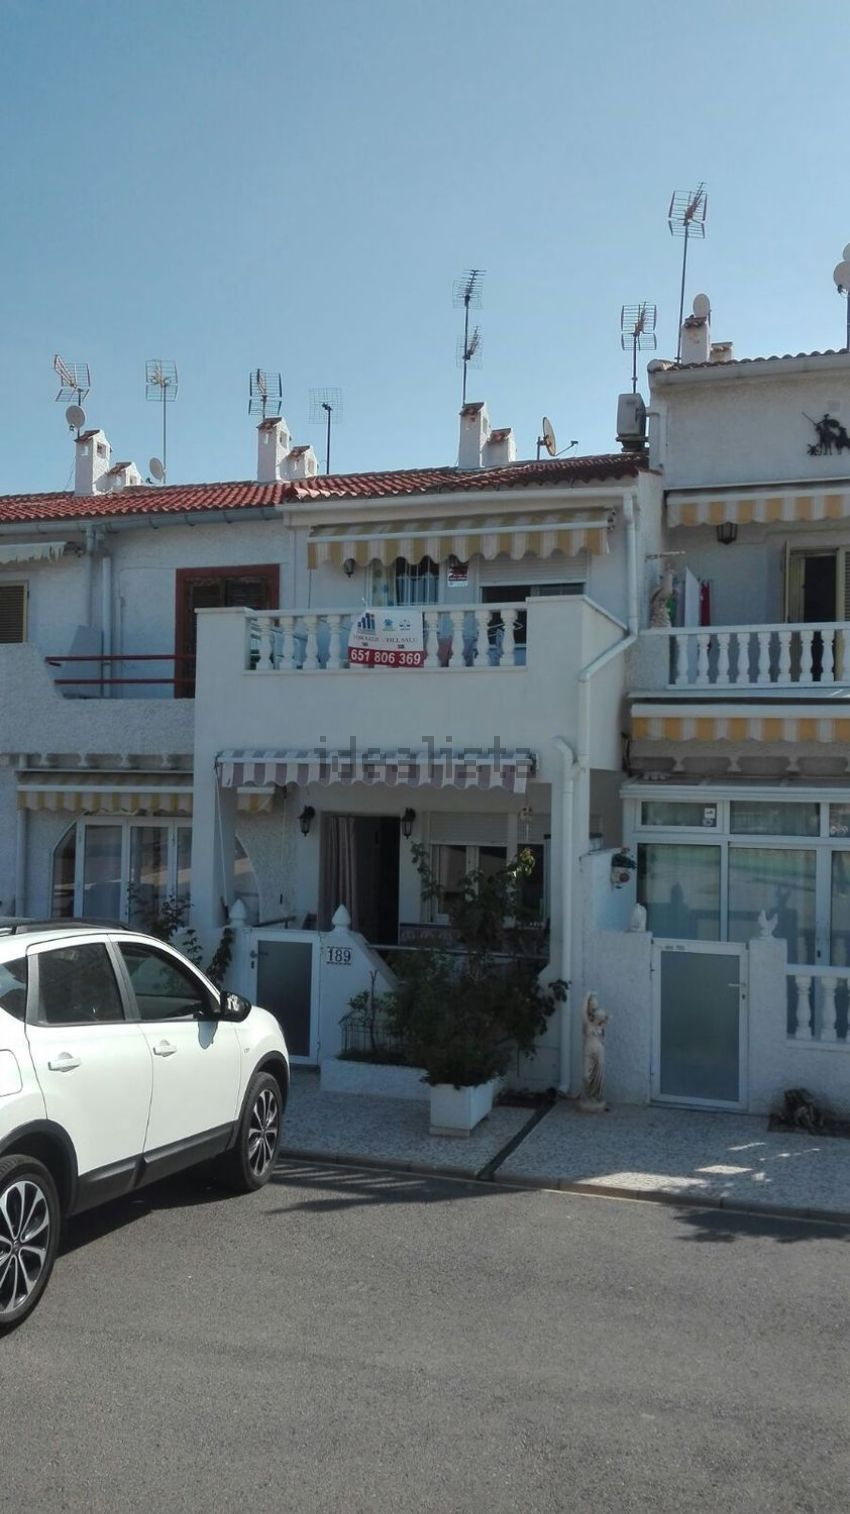 Chalet adosado en calle Castellón, 189, Cabo Cervera, Torrevieja